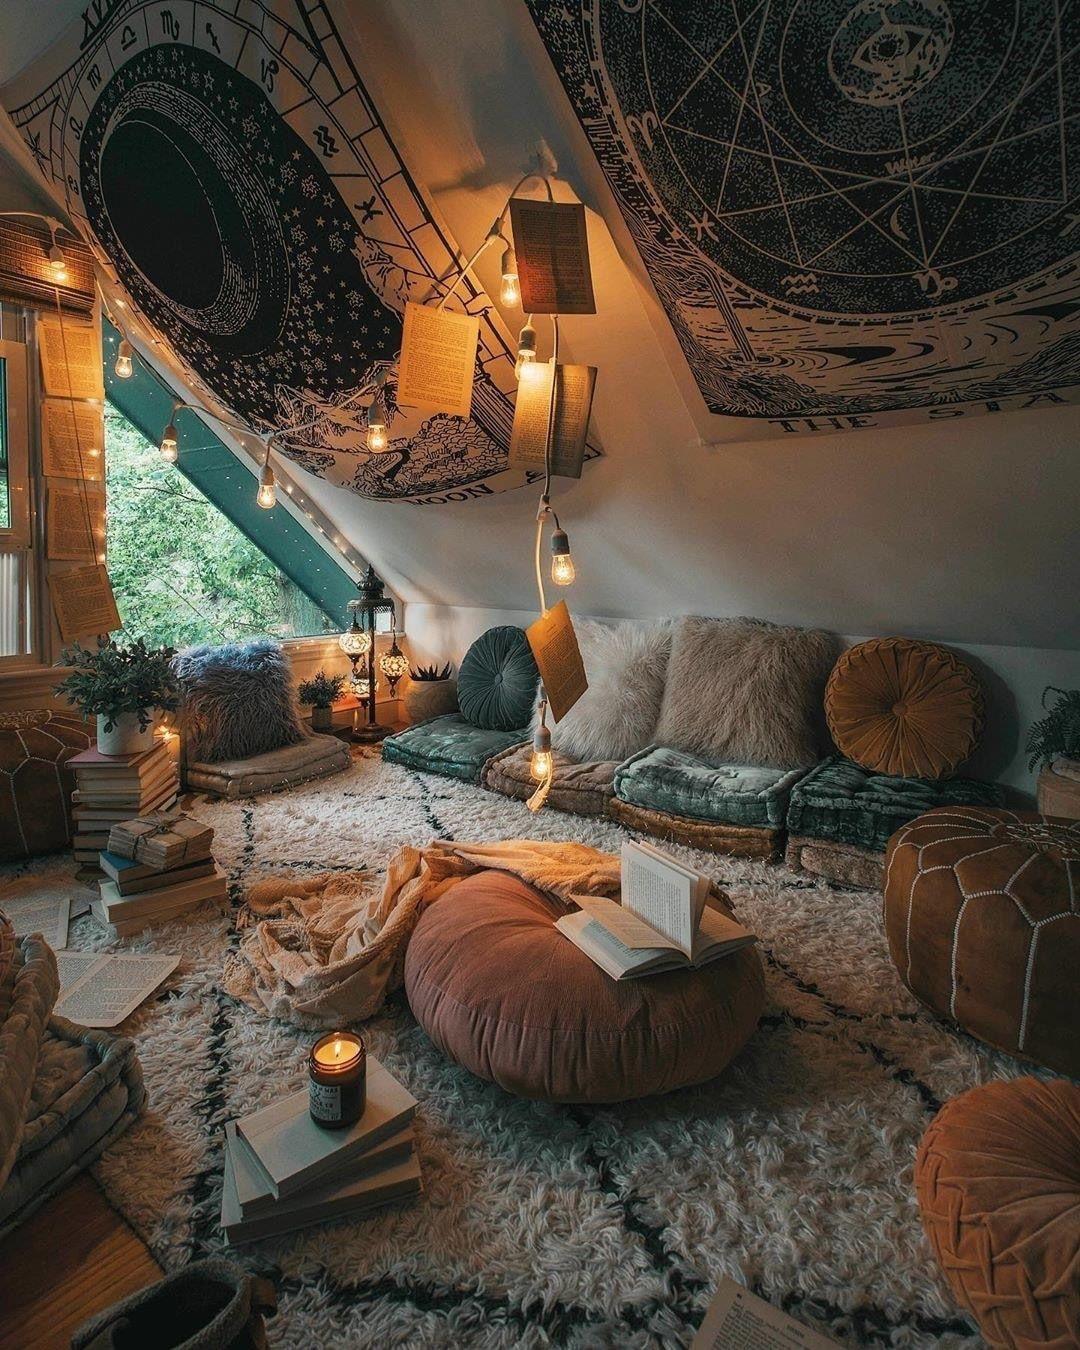 Cute Aesthetic Room Decor Amazon